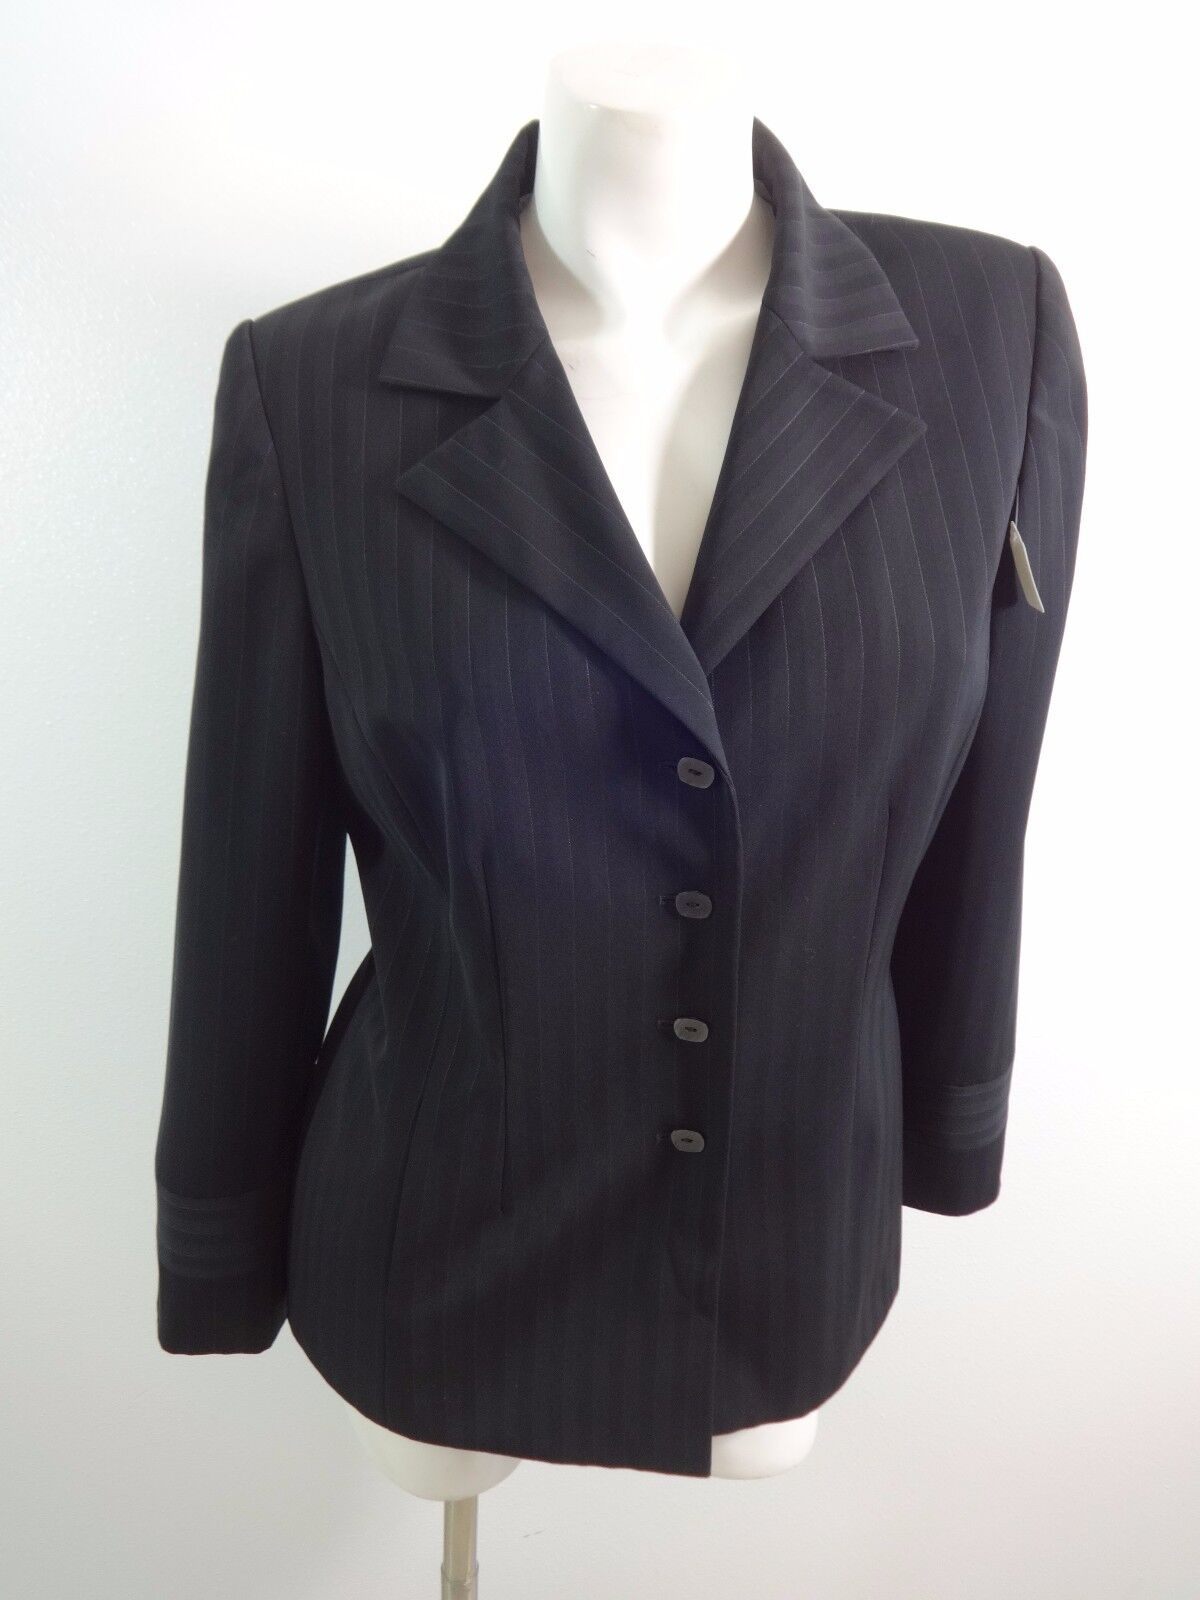 LIZ CLAIBORNE Tweed Jacket Womens Luxurious Black Colorful Business Blazer Coat